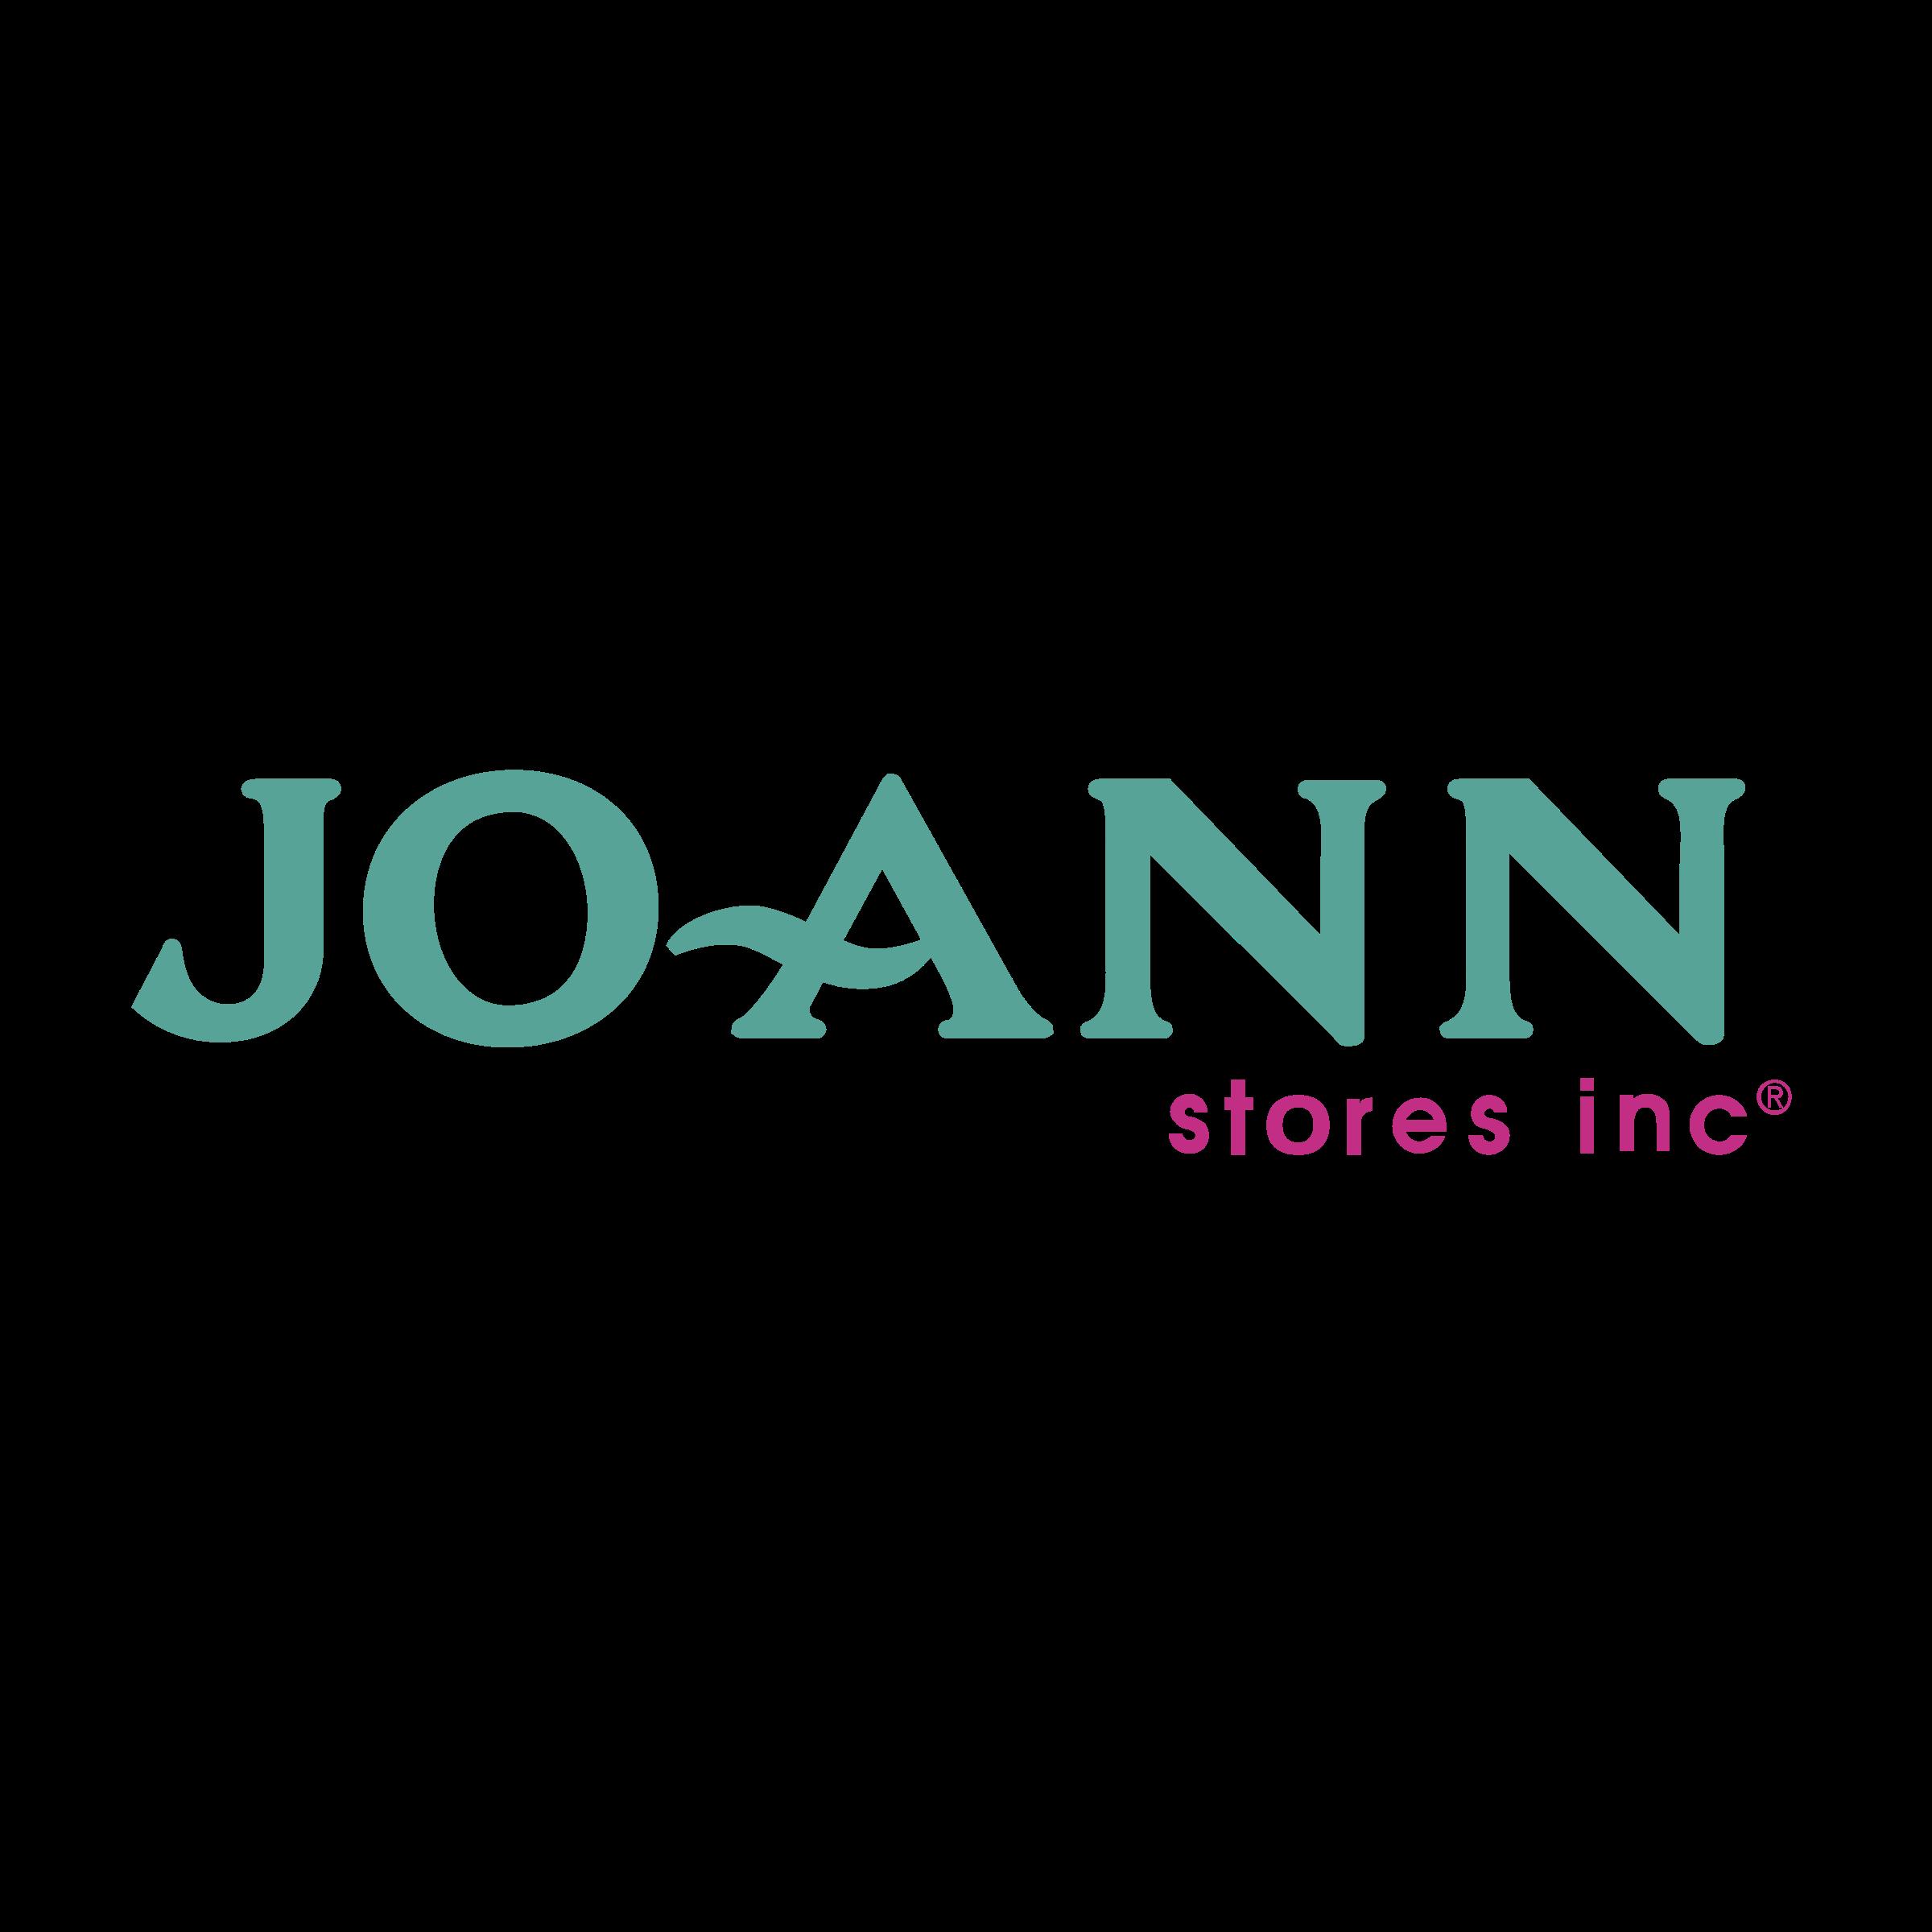 Jo Ann Stores Logo PNG Transparent & SVG Vector.